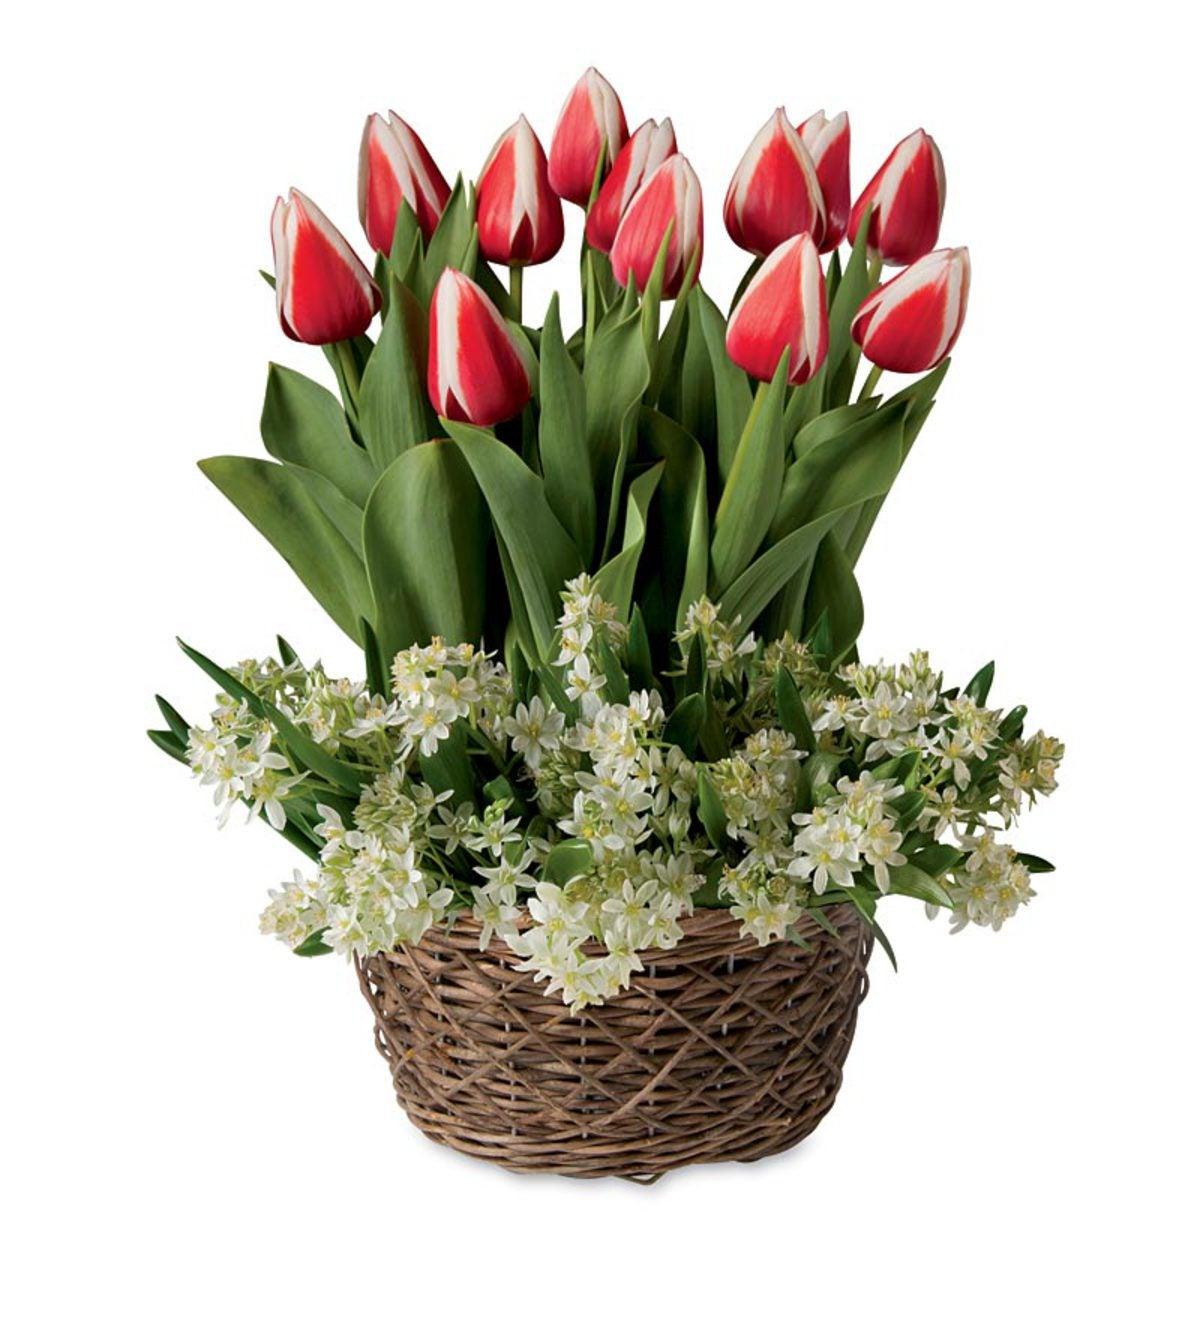 Tulips And Mini Star Of Bethlehem Pre Planted Flower Bulb Gift